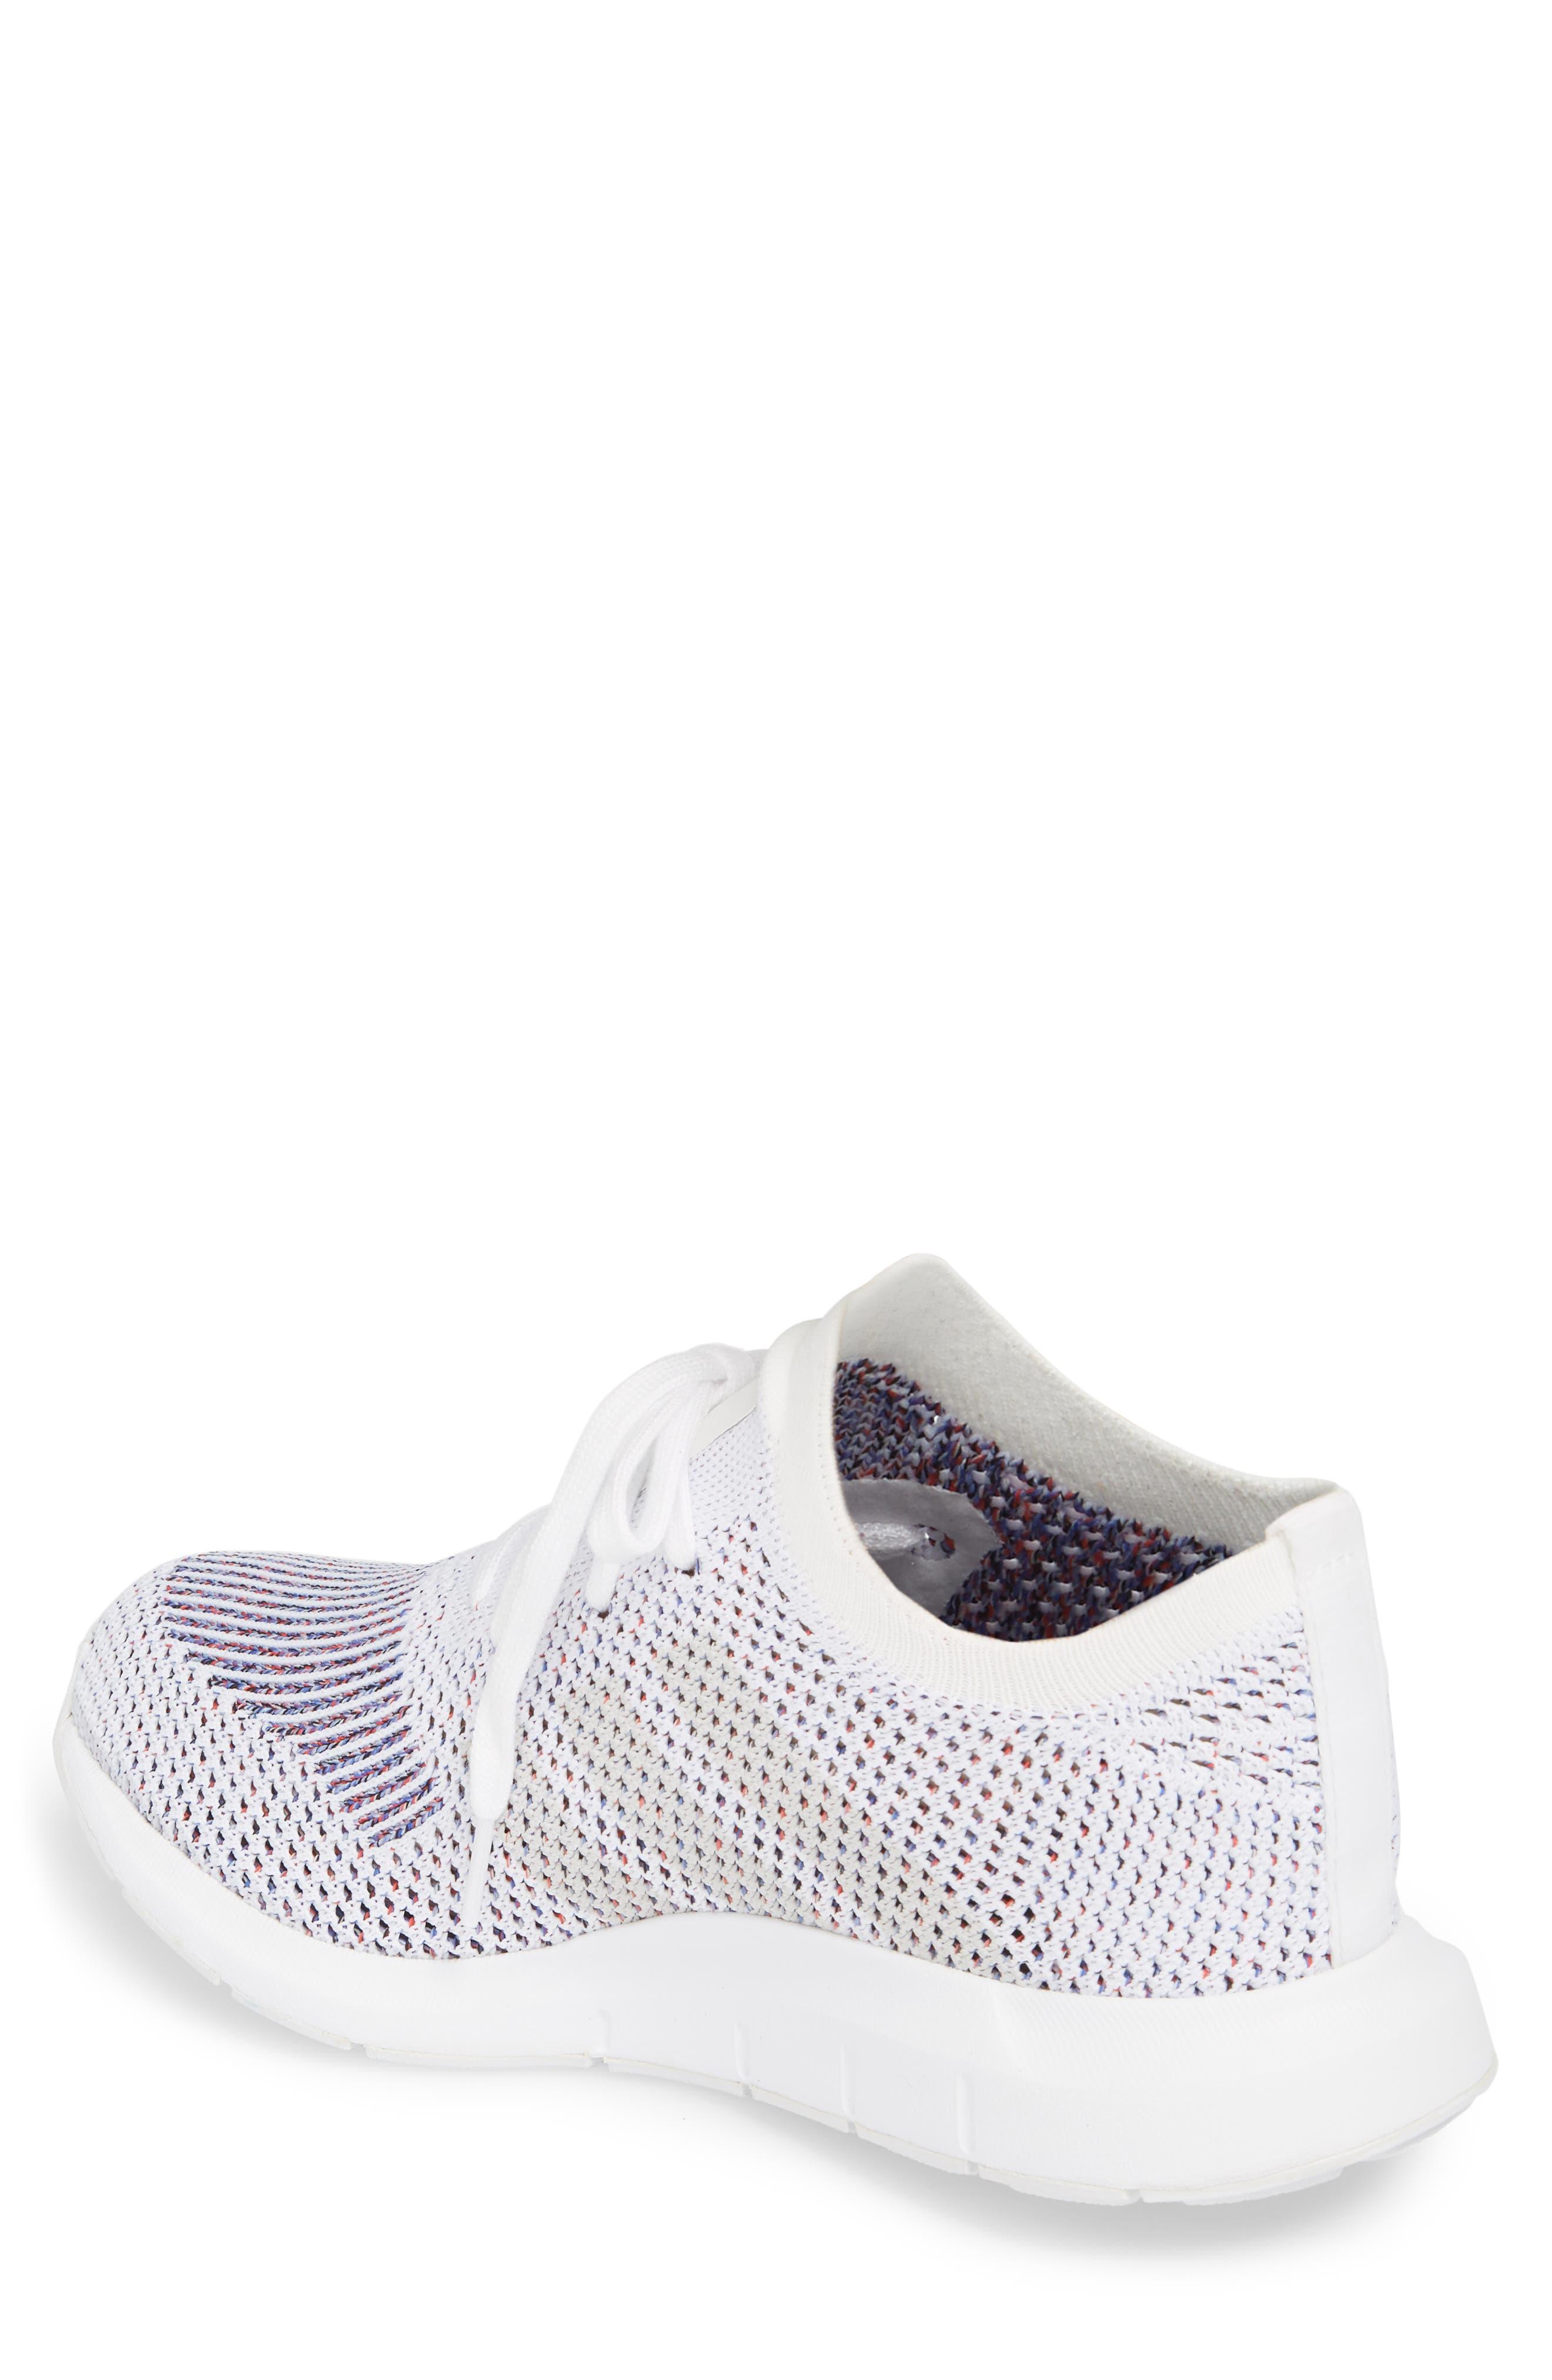 Swift Run Primeknit Training Shoe,                             Alternate thumbnail 2, color,                             White/ Grey Heather Grey